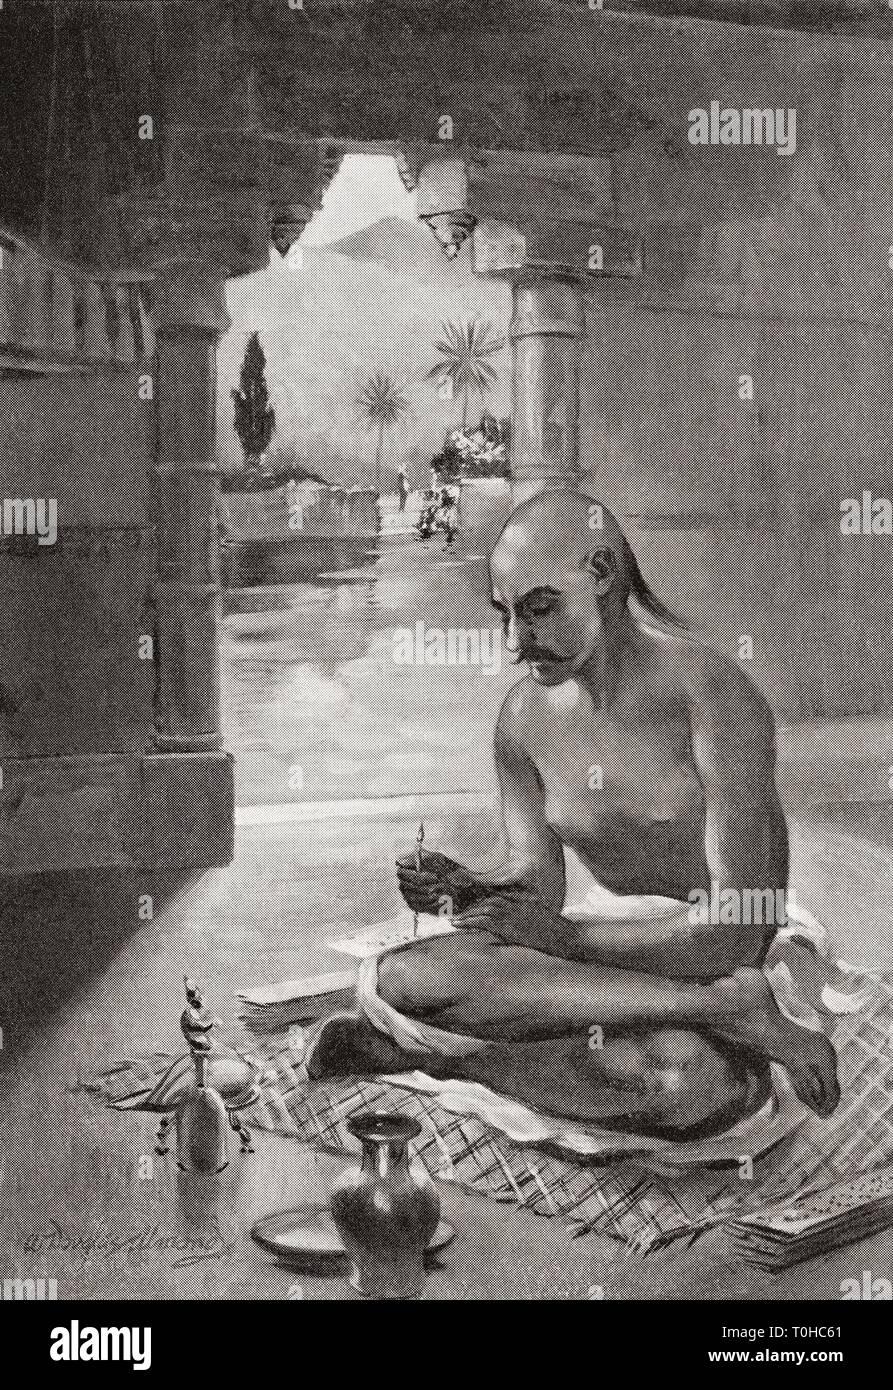 Kalidasa writing the poem Meghaduta - Stock Image